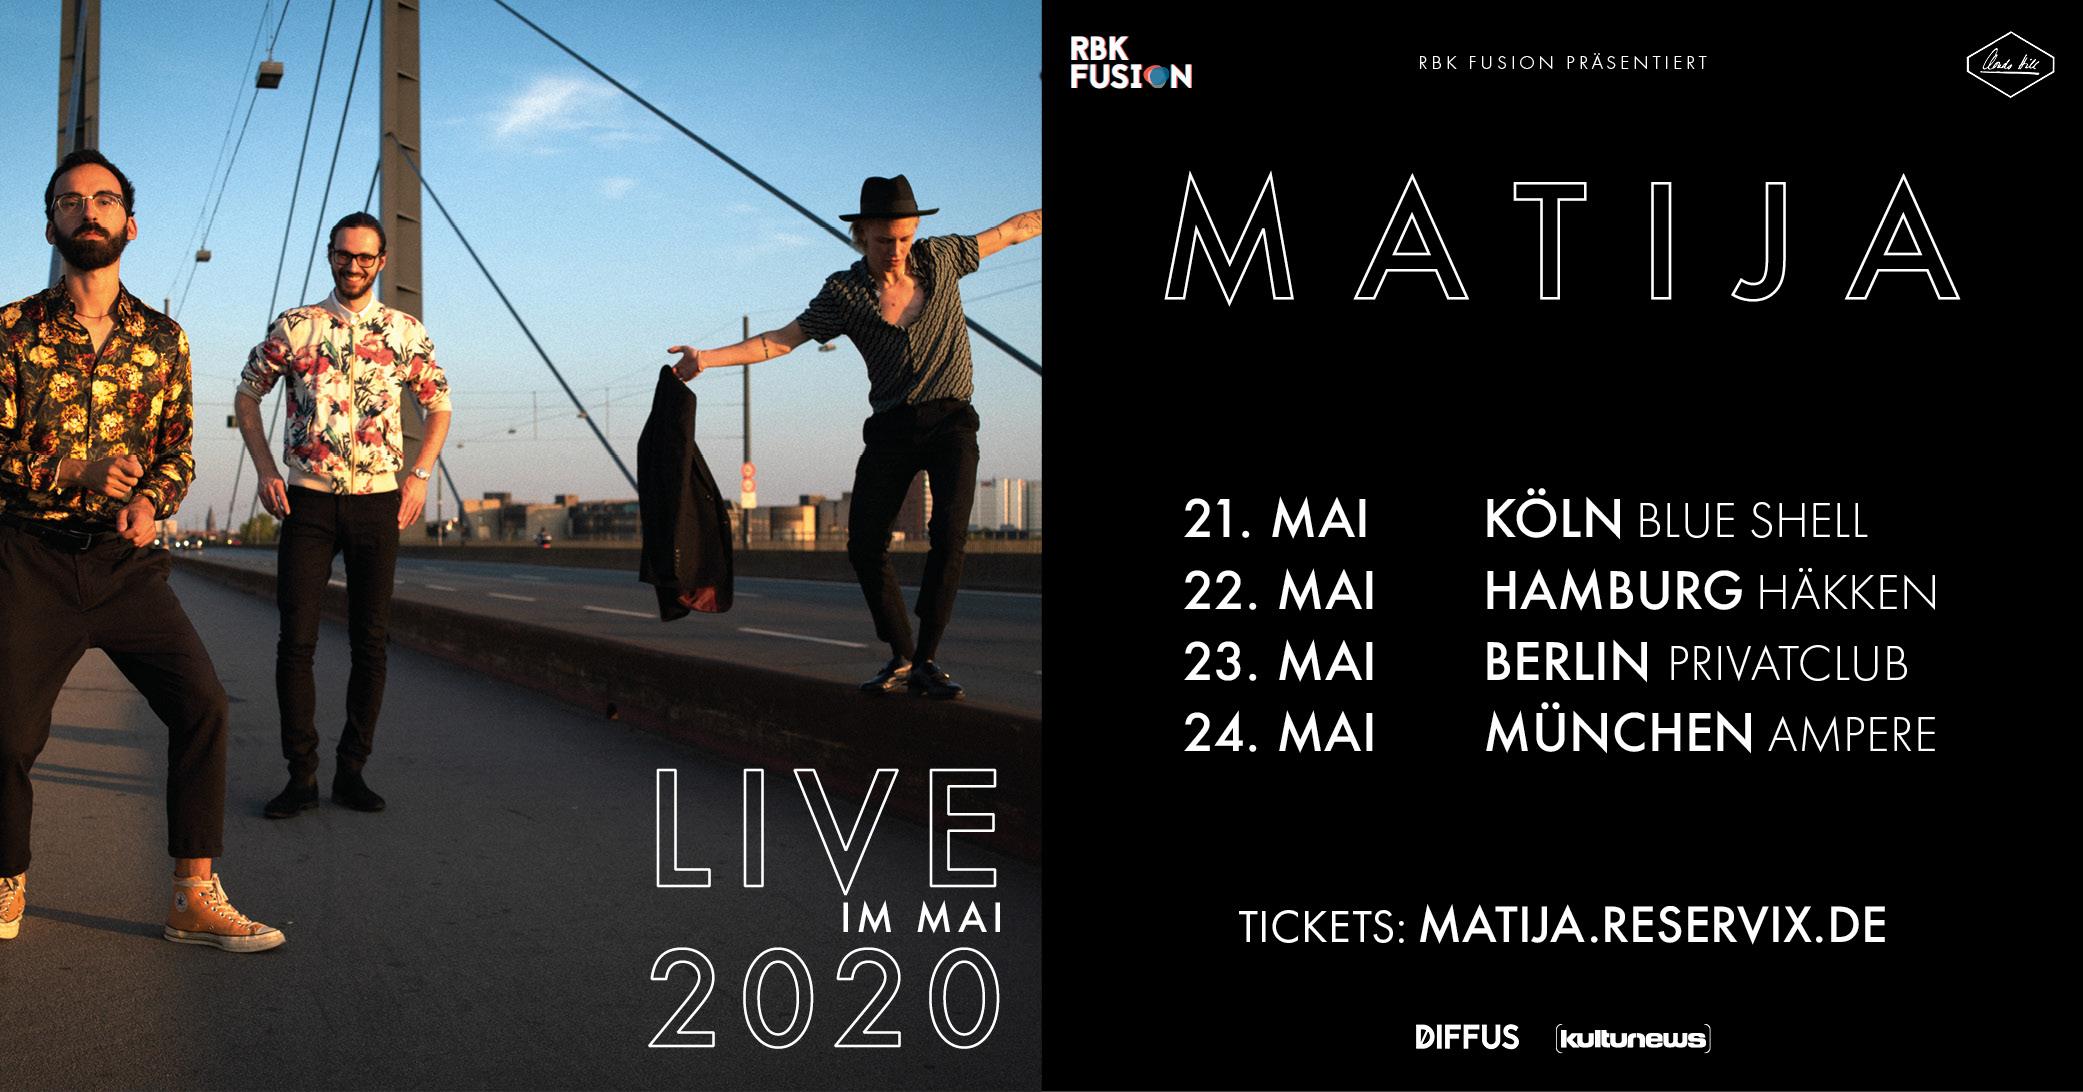 MATIJA-Tour-2020-FB-VA-Header